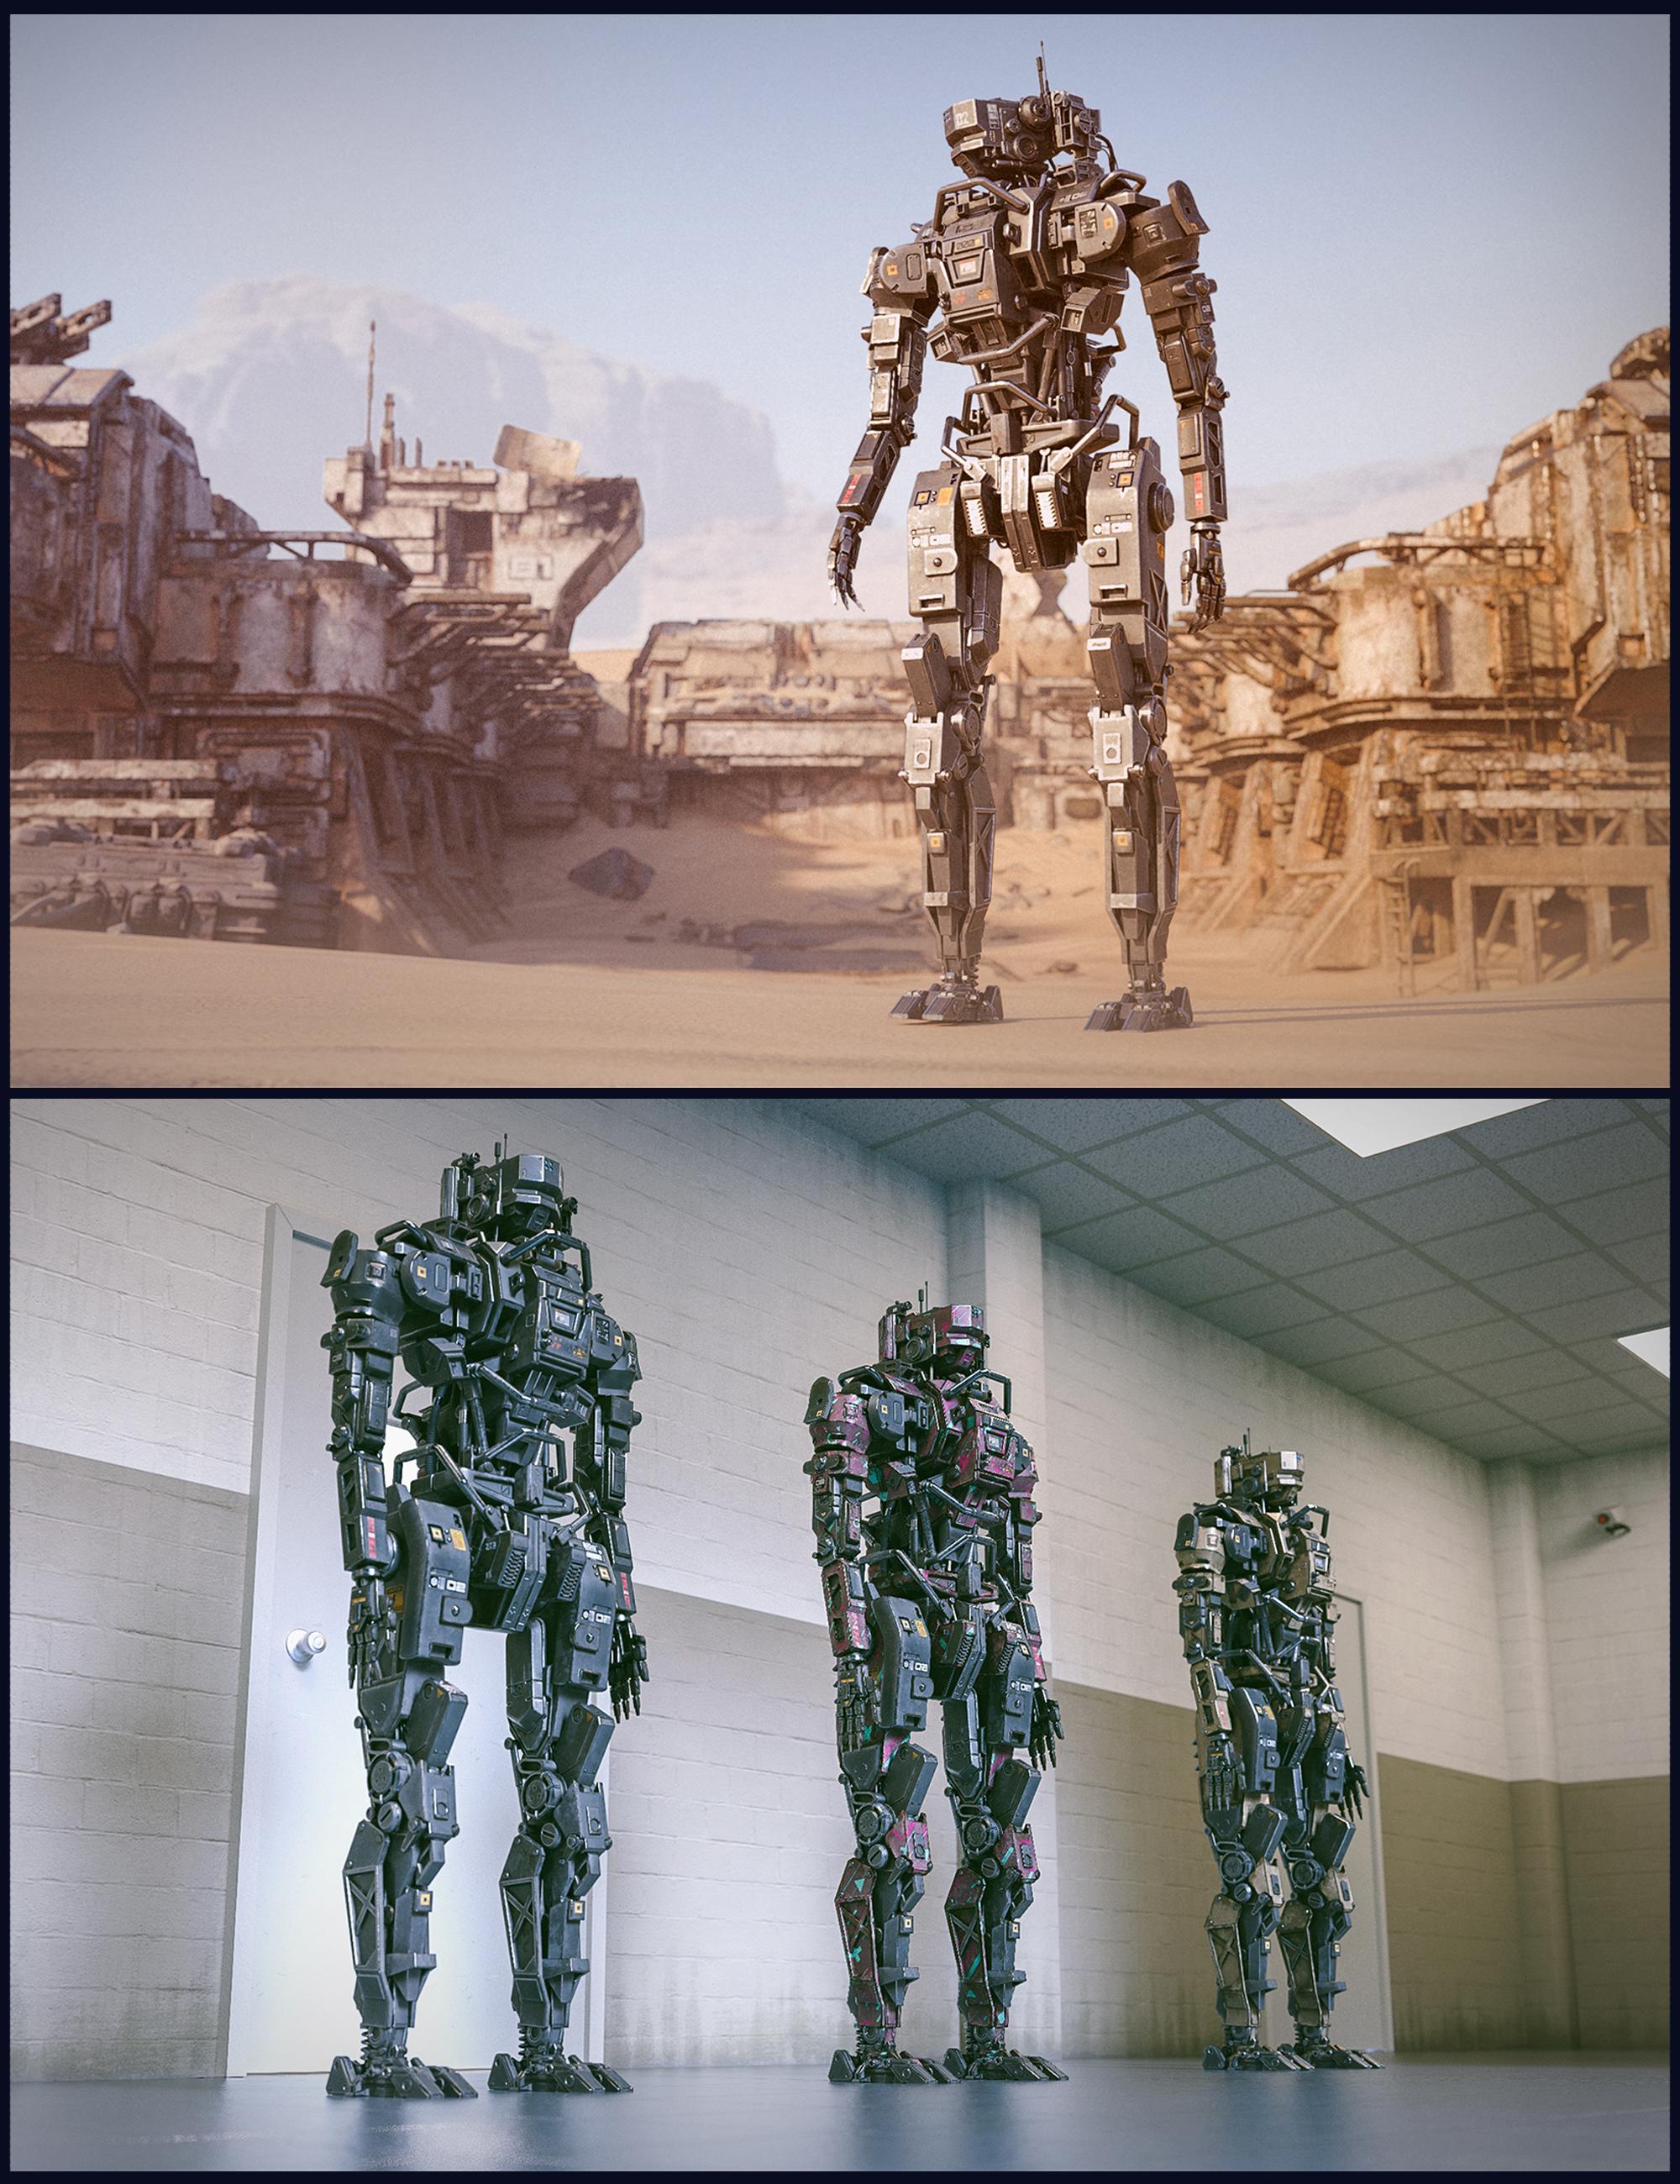 Cyberpunk MEC Droid by: Polish, 3D Models by Daz 3D